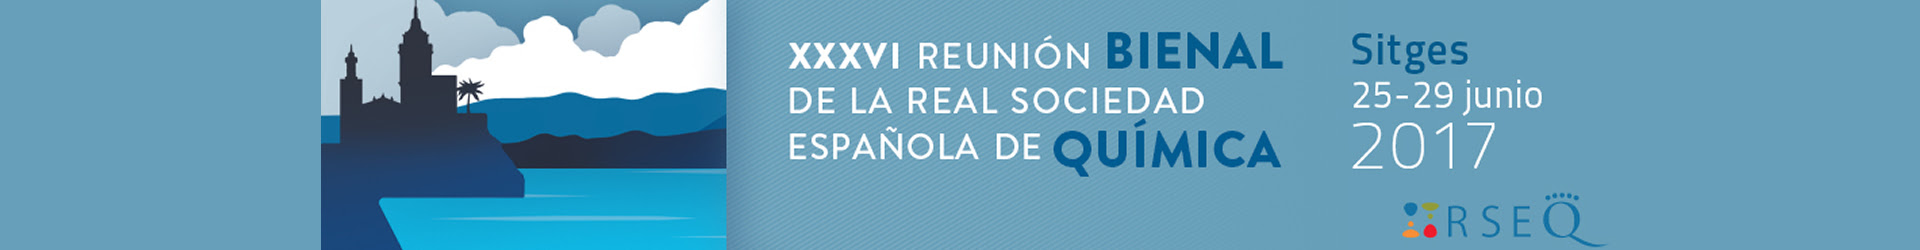 rseq-bienal